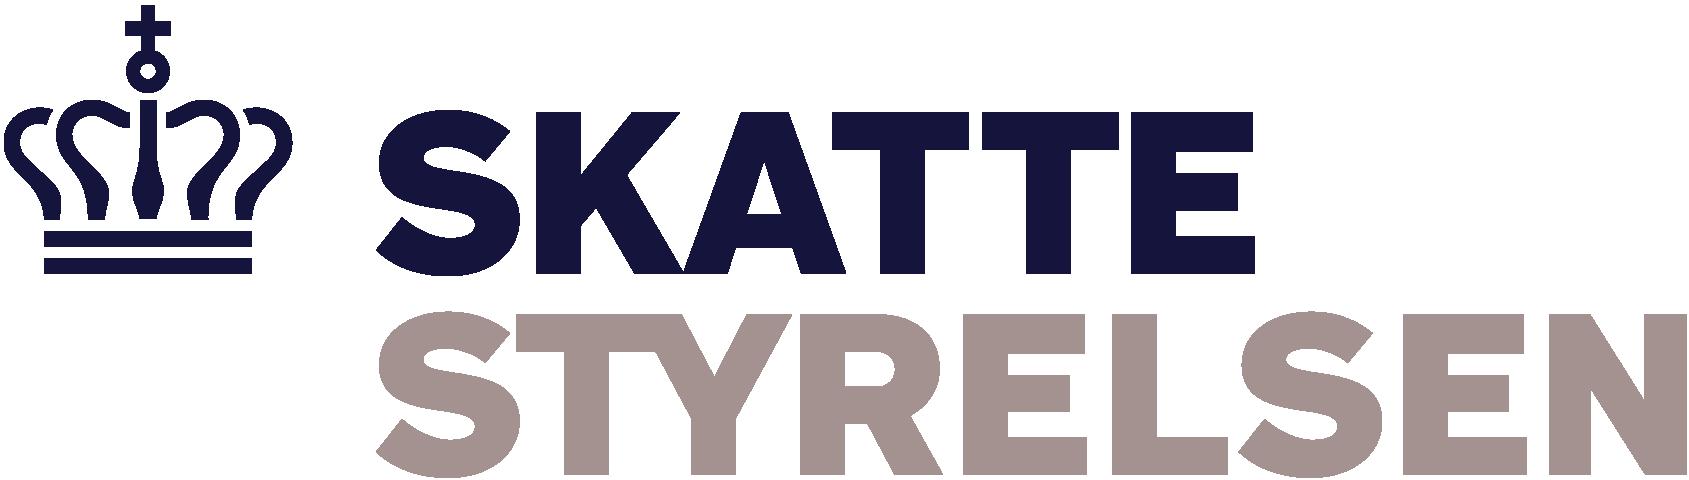 Skattestyrelsen - The Danish Tax Agency